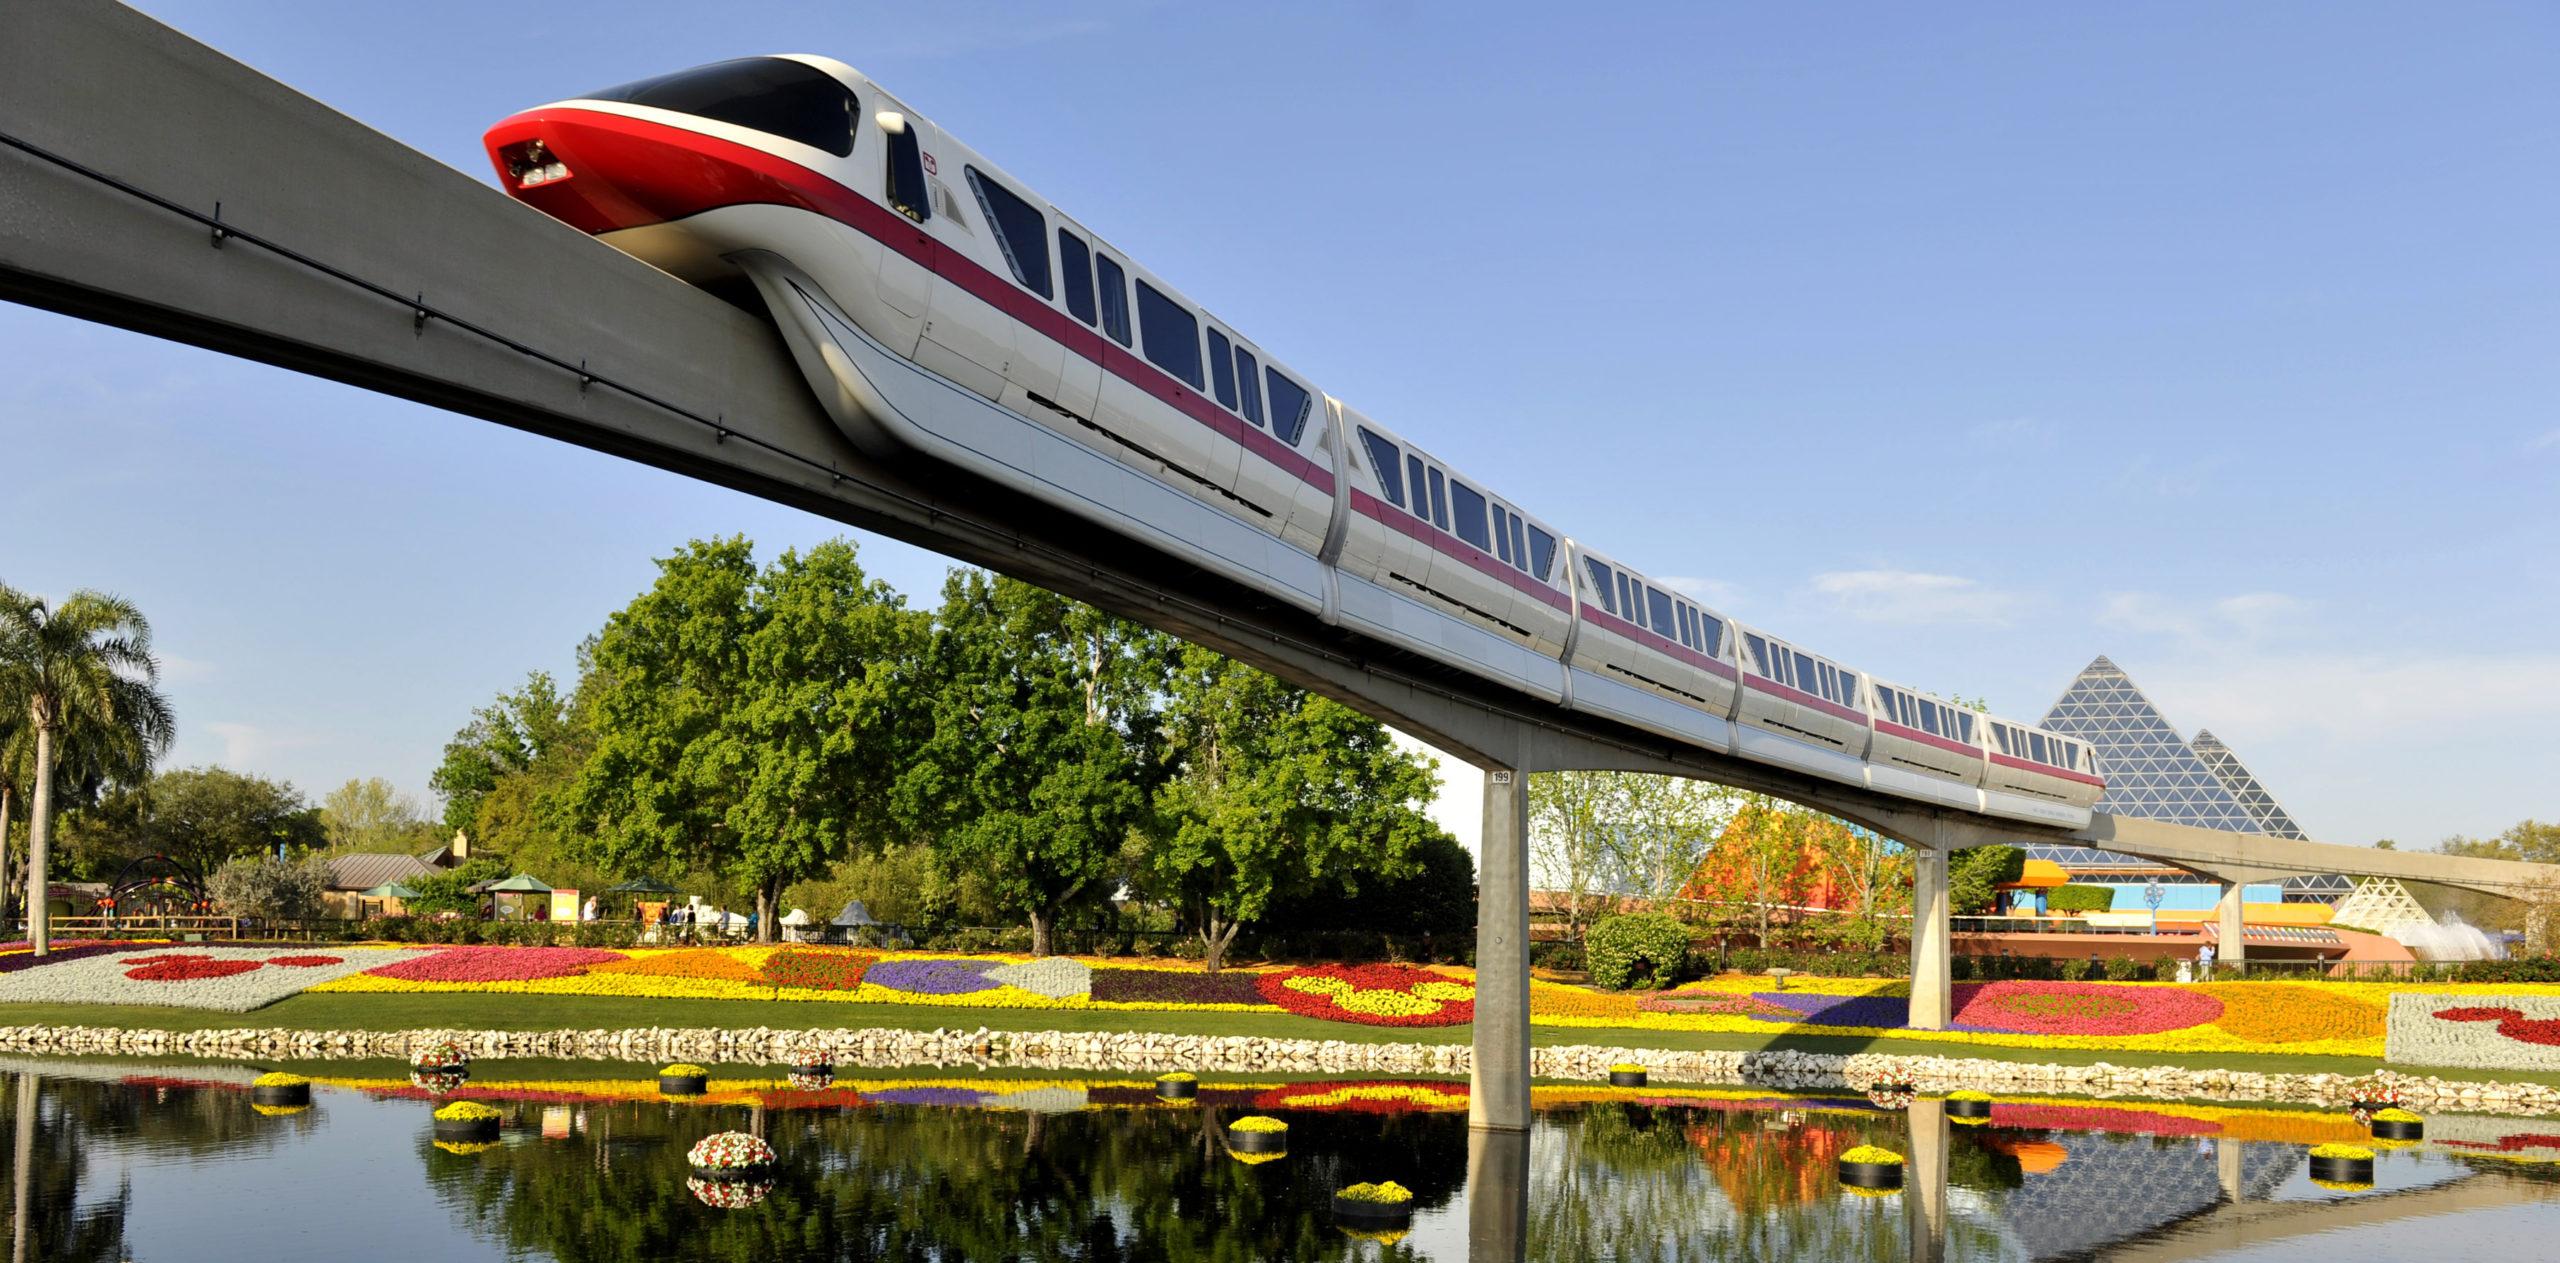 Monorail Disney.